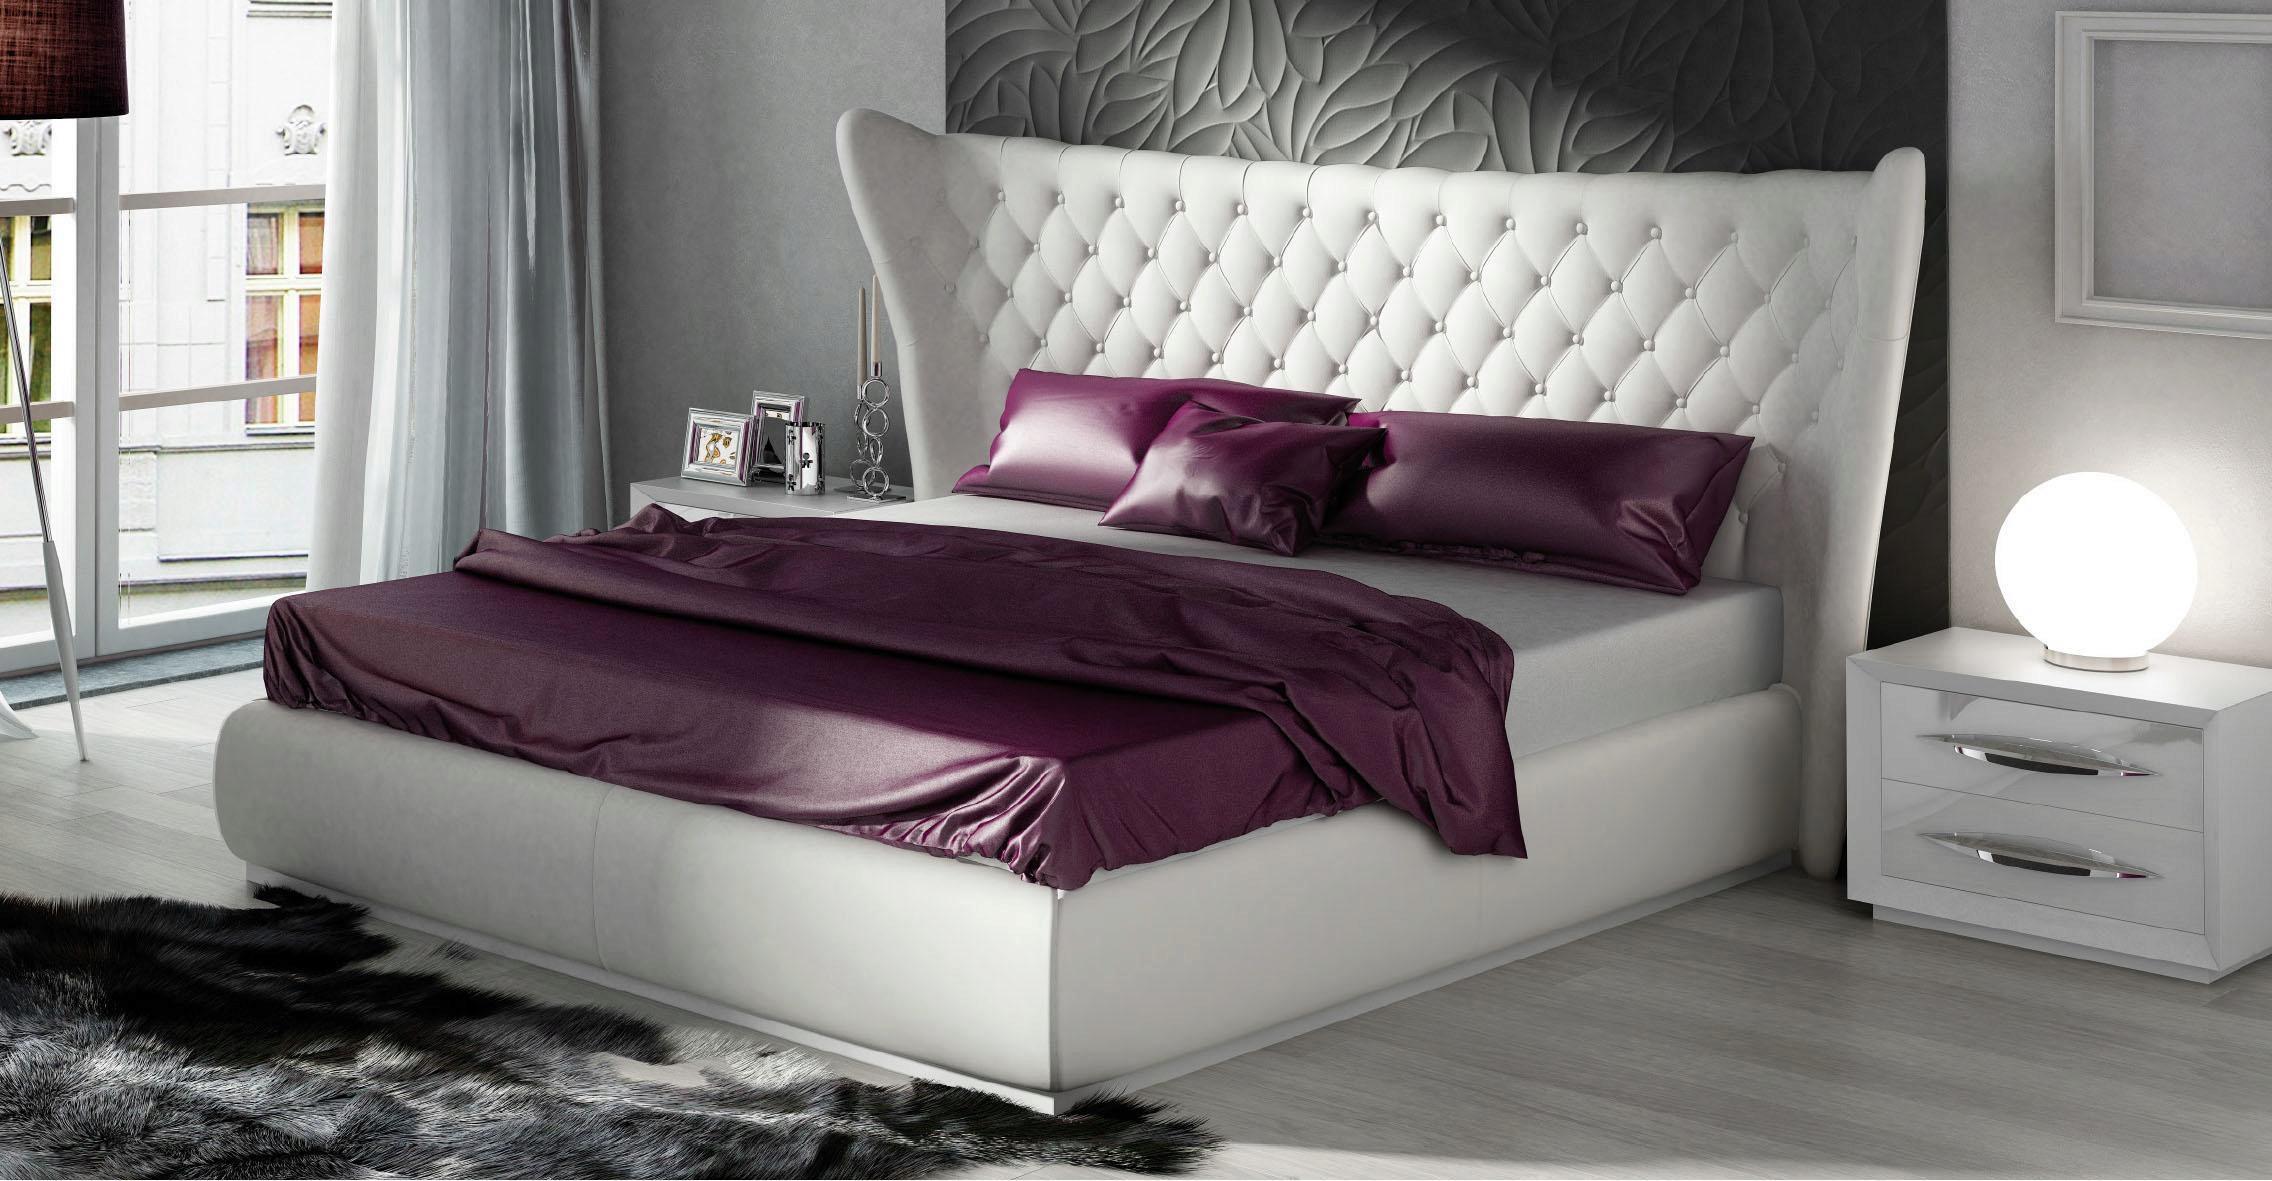 king bedroom set 5pcs ecoleather modern made in spain esf